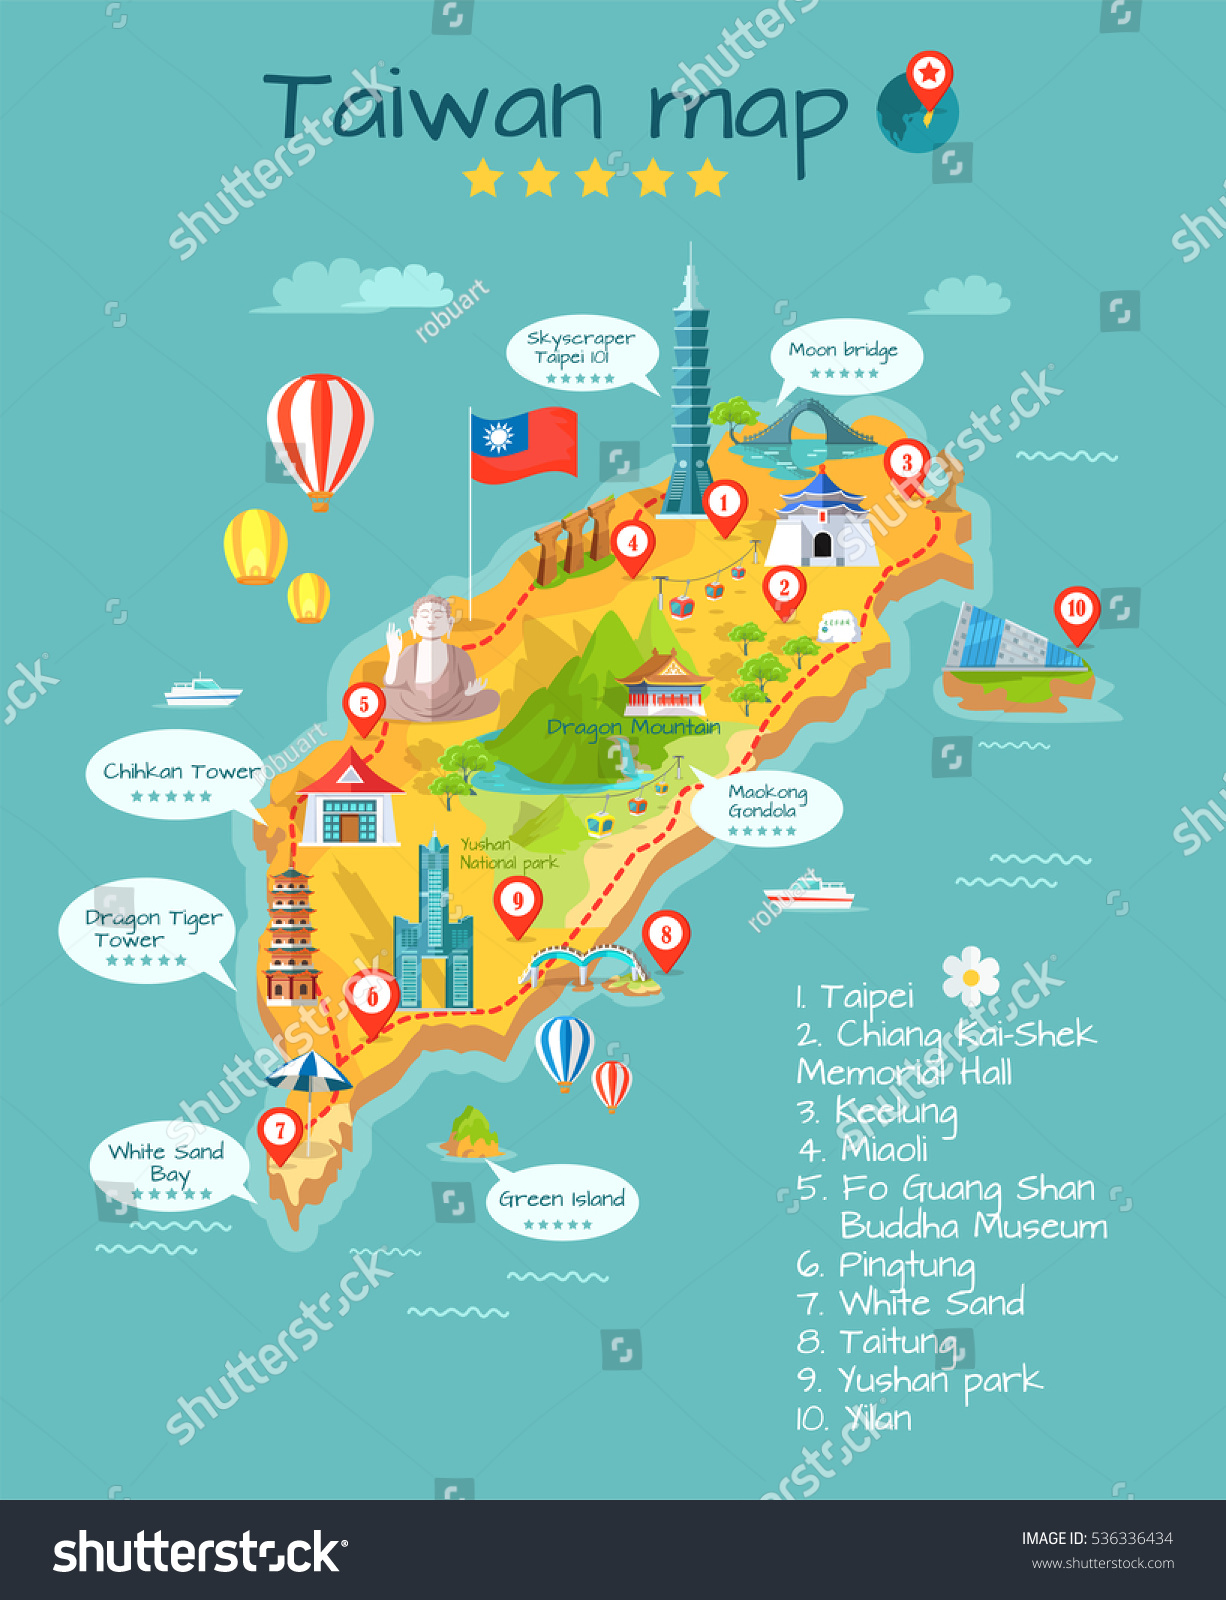 Taiwan Kartta Sightseeing Taipeissa Chiang Kai Shekin